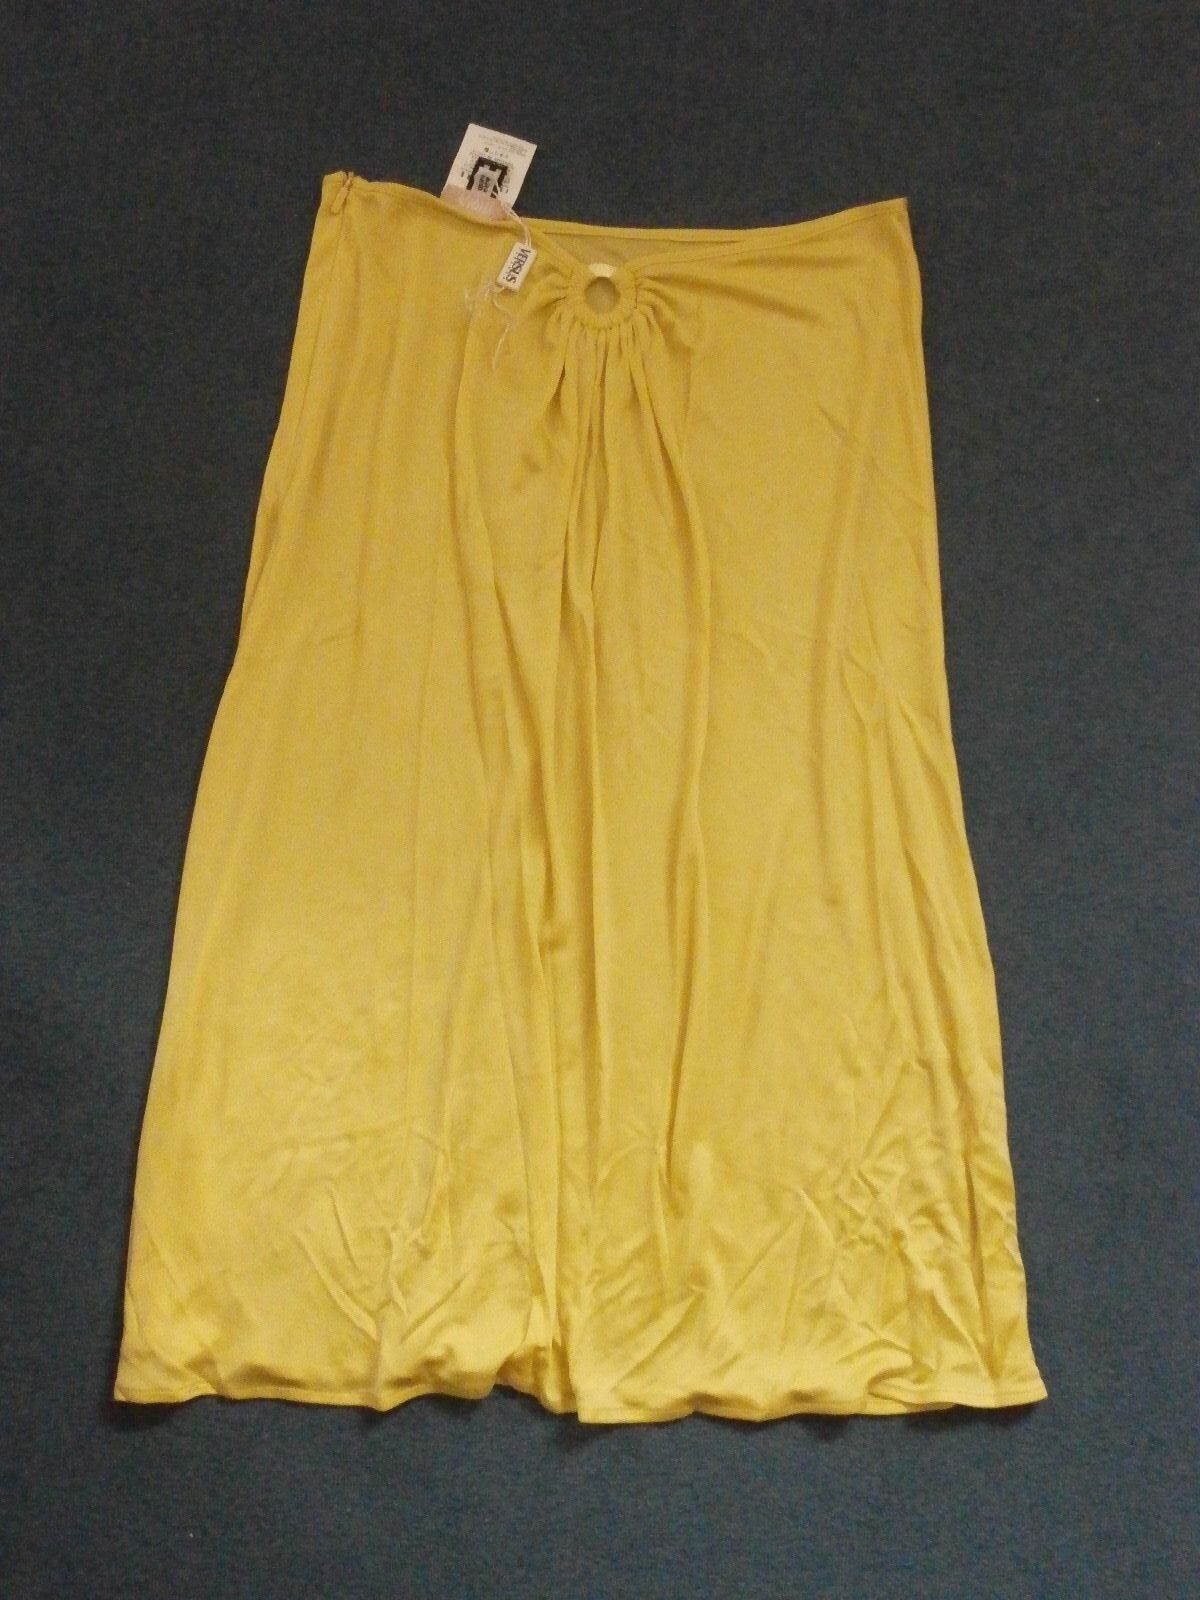 Versus Versace yellow size 28 skirt